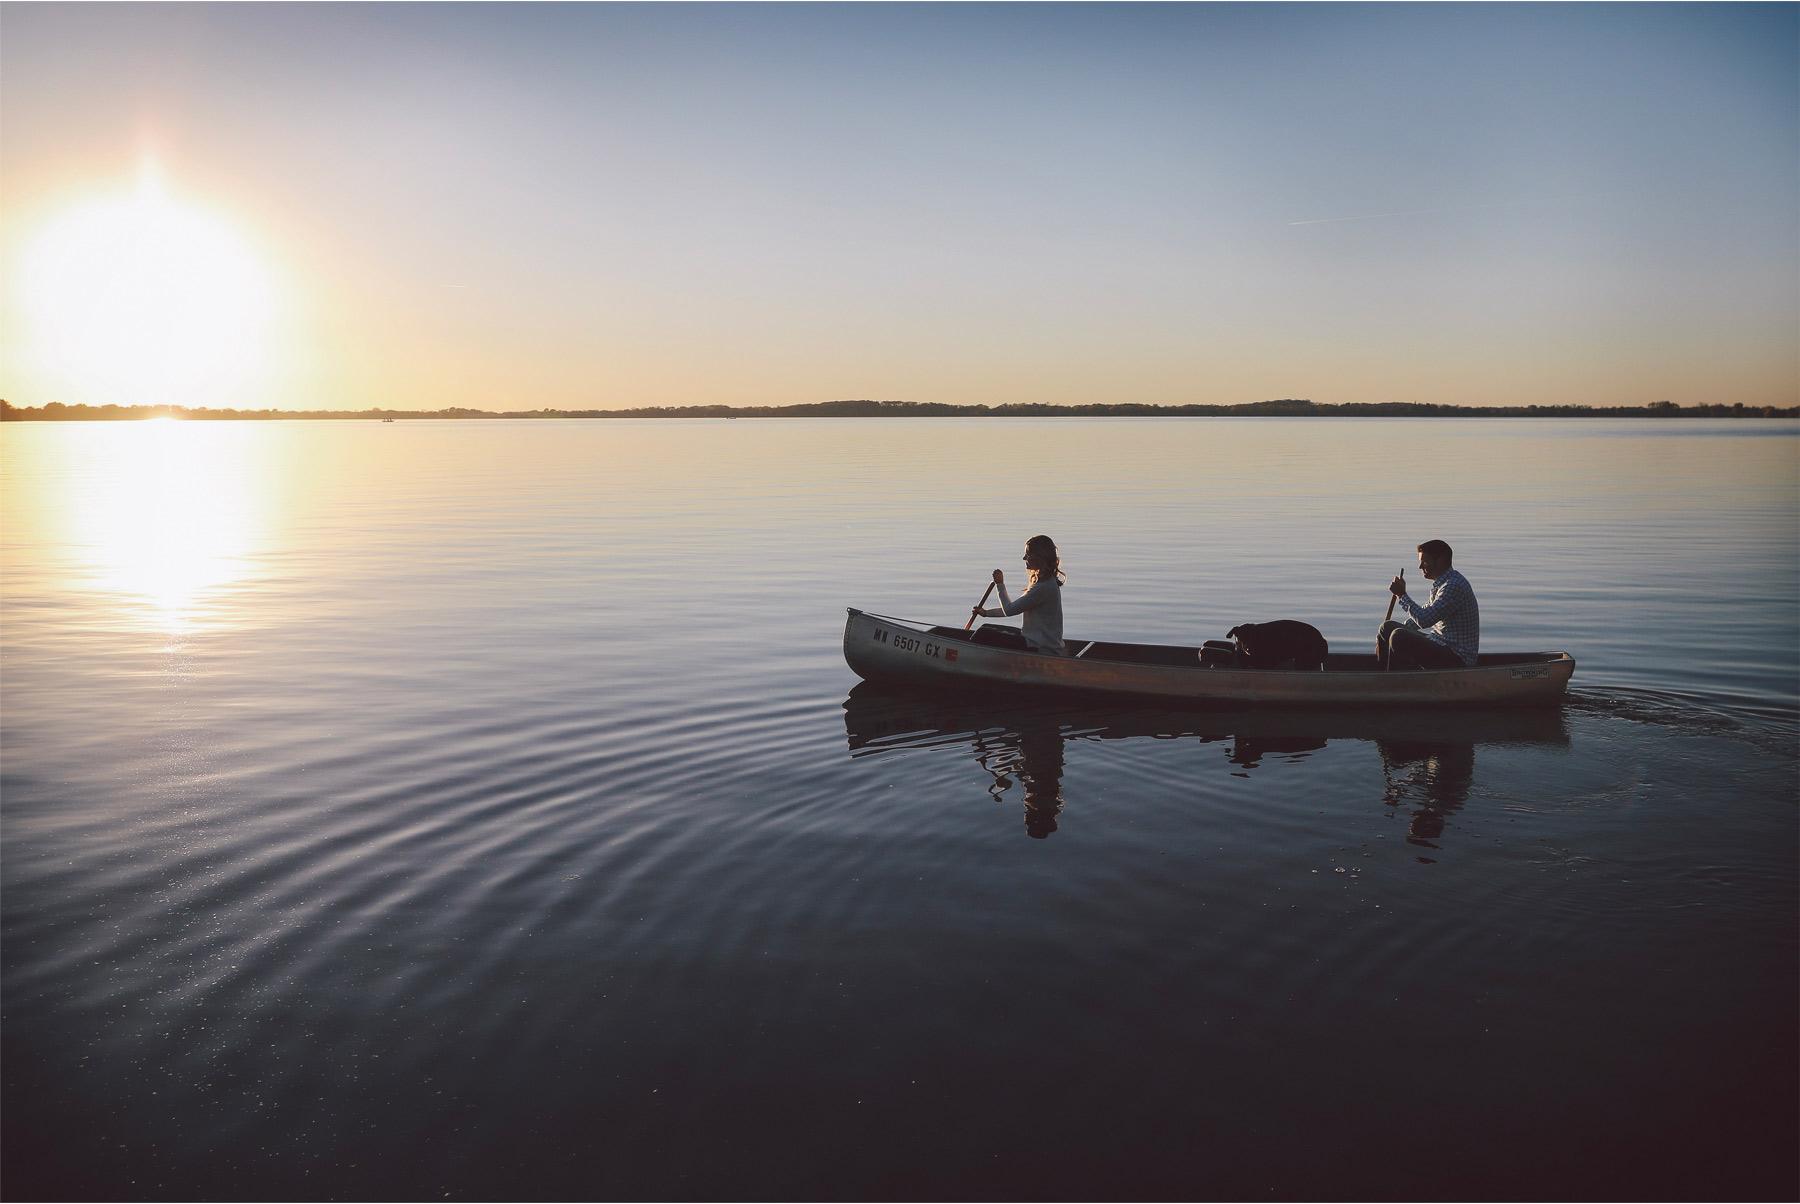 12-Vick-Photography-Destination-Engagement-Session-Canoe-Dog-Lake-Sunset-Katie-and-Bob.jpg